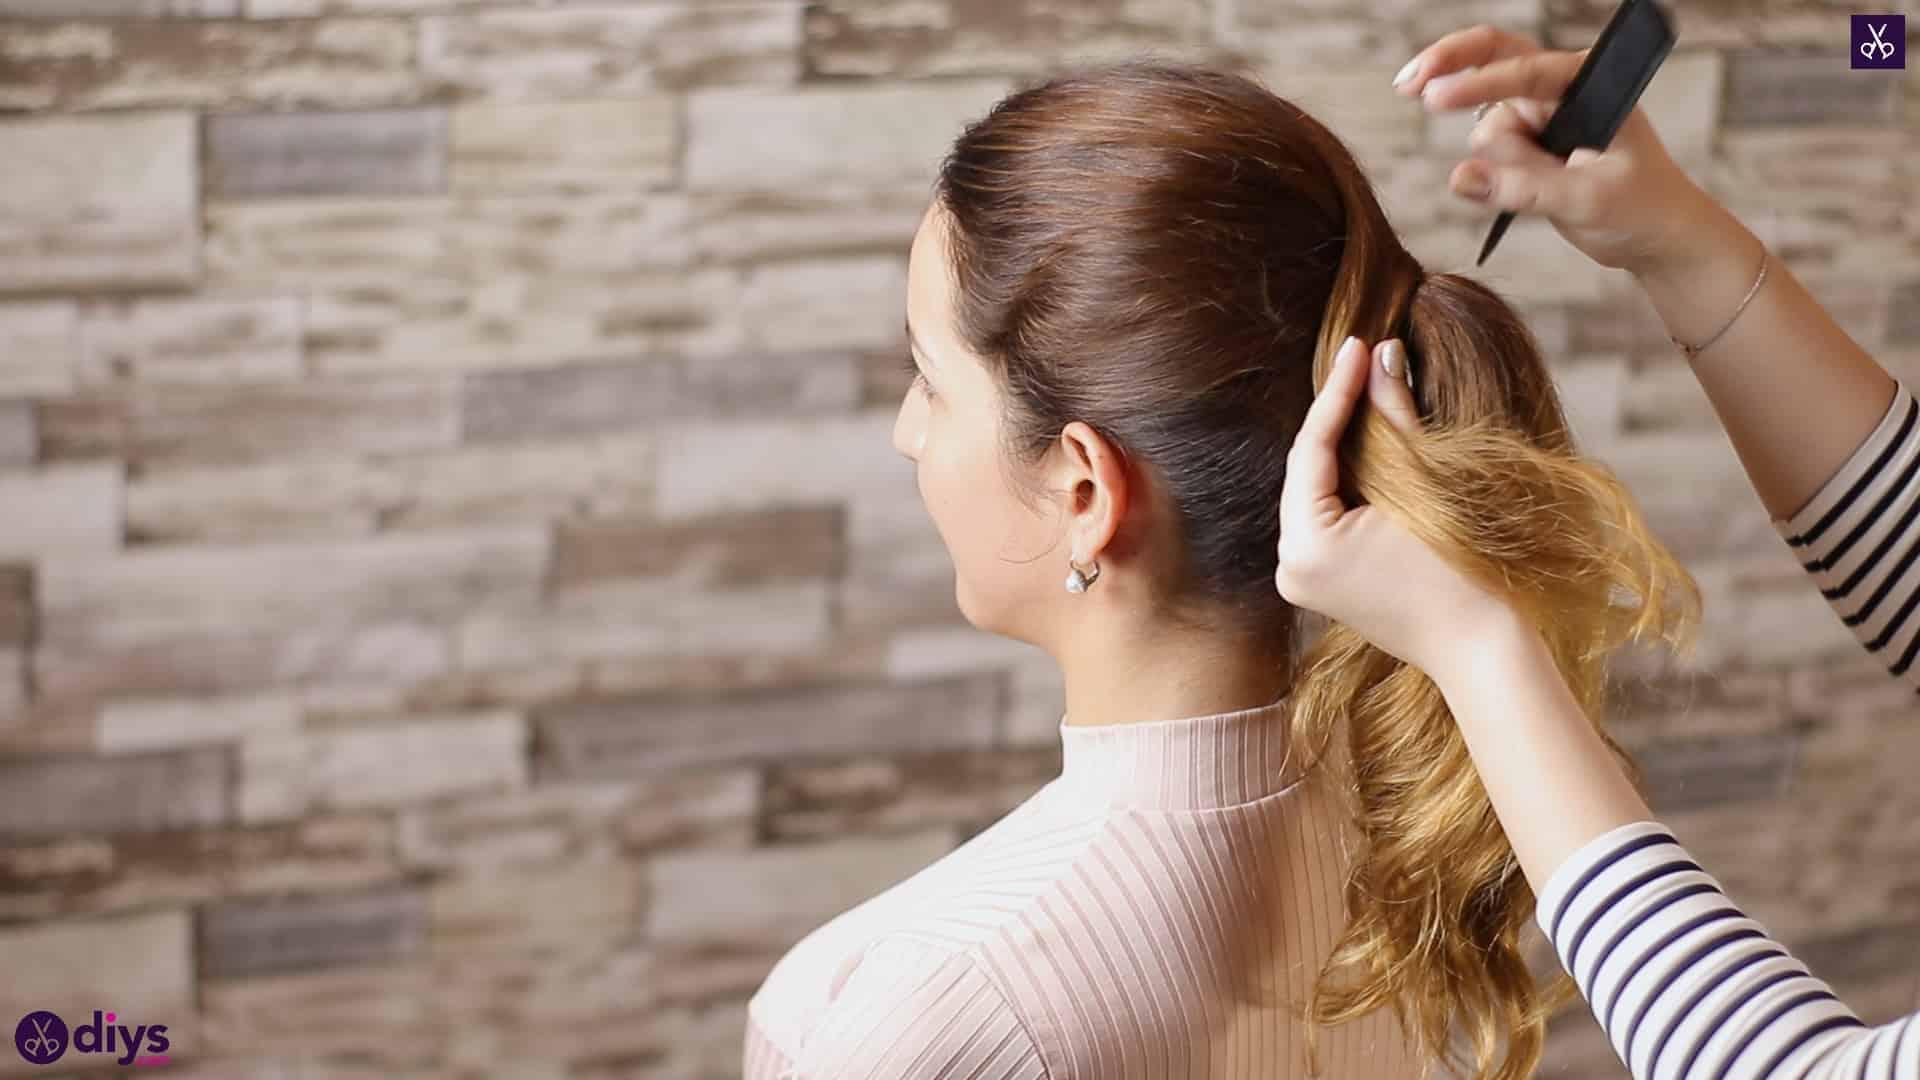 3 easy ponytails for everyday wear wraparound pony step 4b